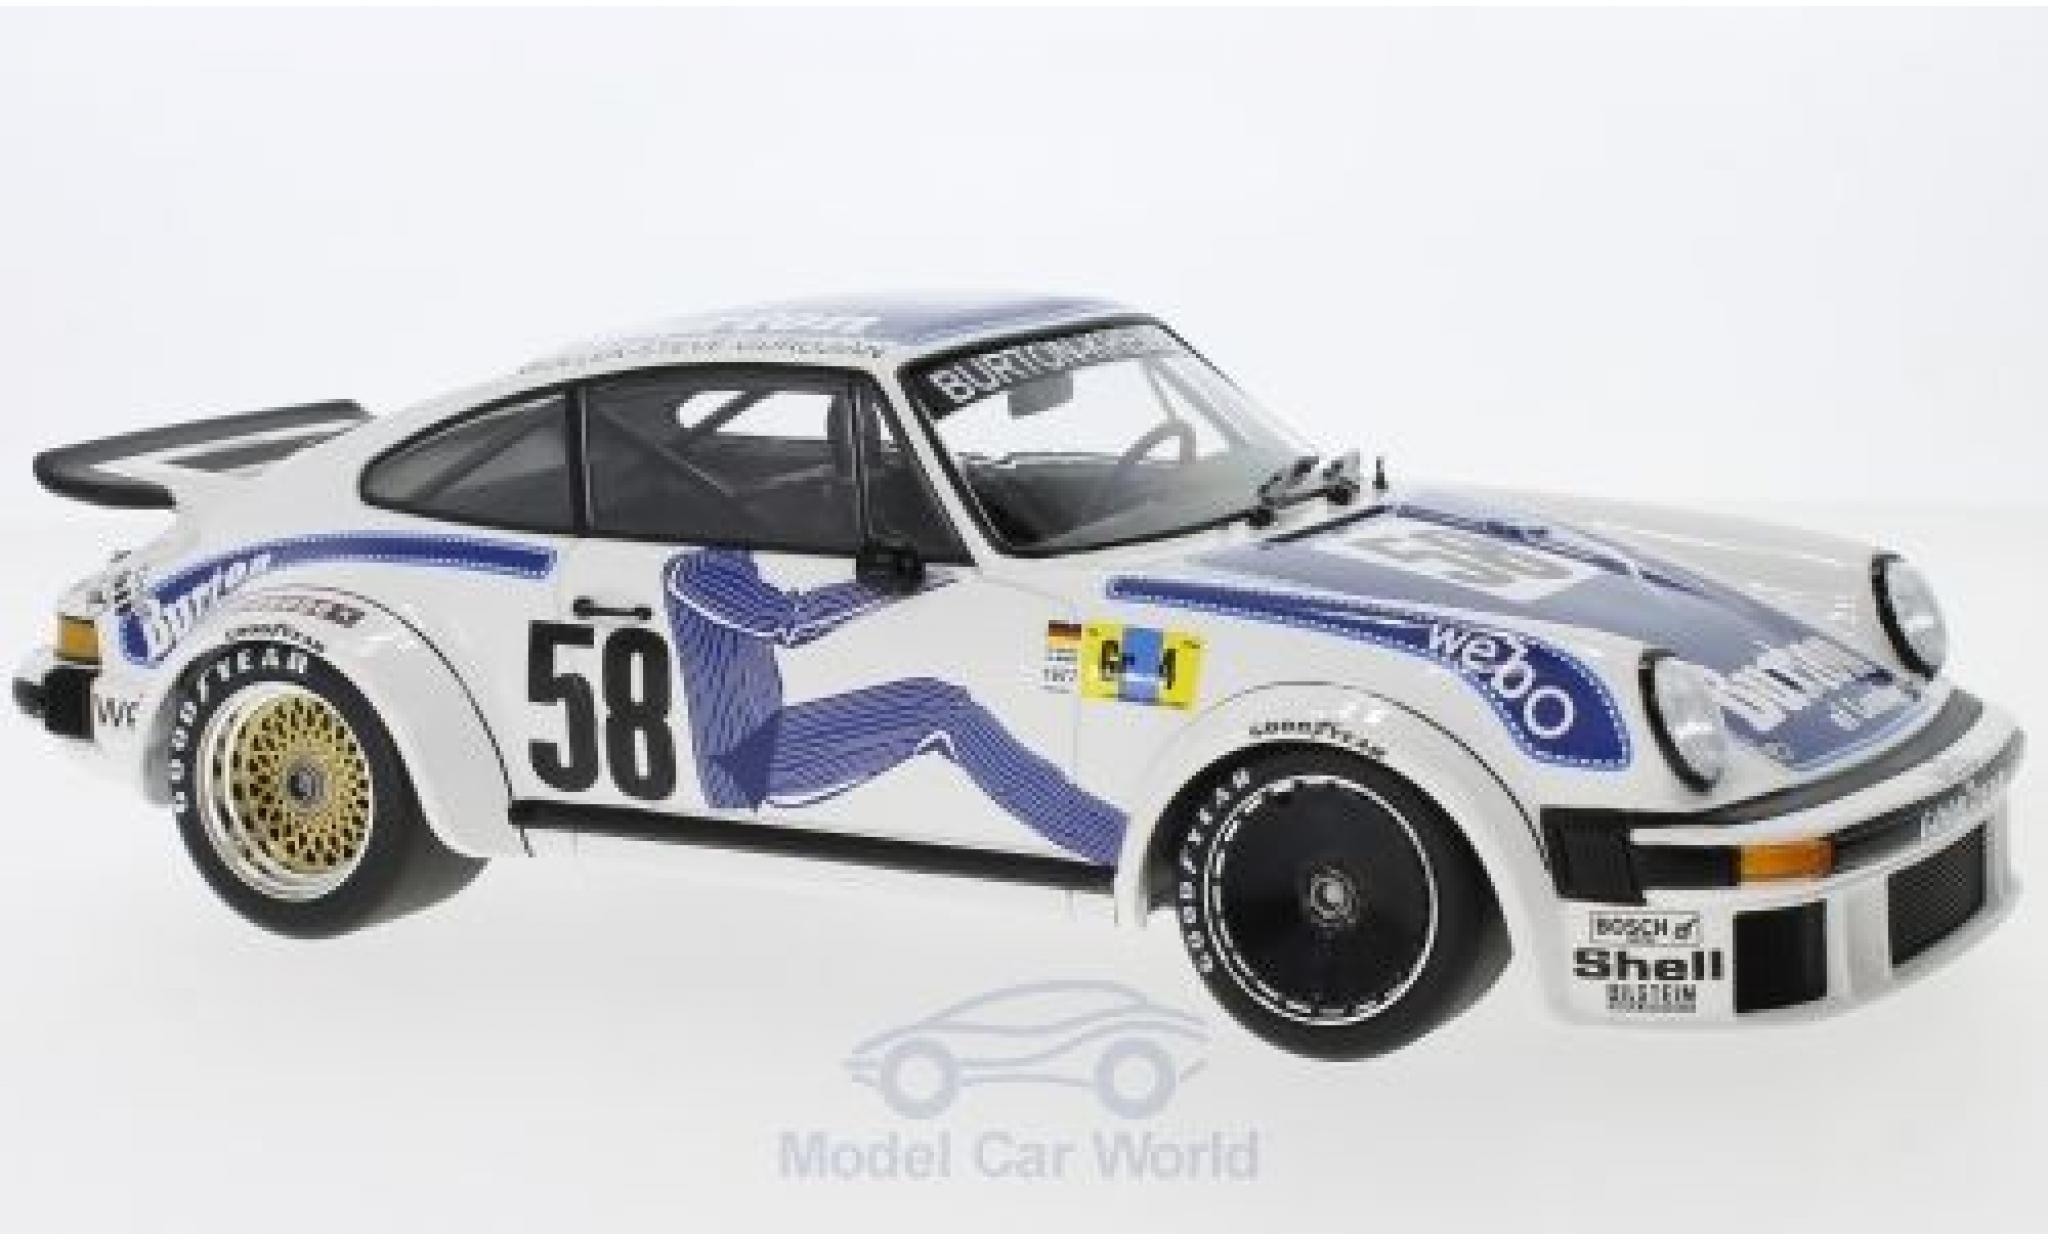 Porsche 934 1977 1/18 Minichamps No.58 Kremer Racing 24h Le Mans B.Wollek/Steve/P.Gurdjian